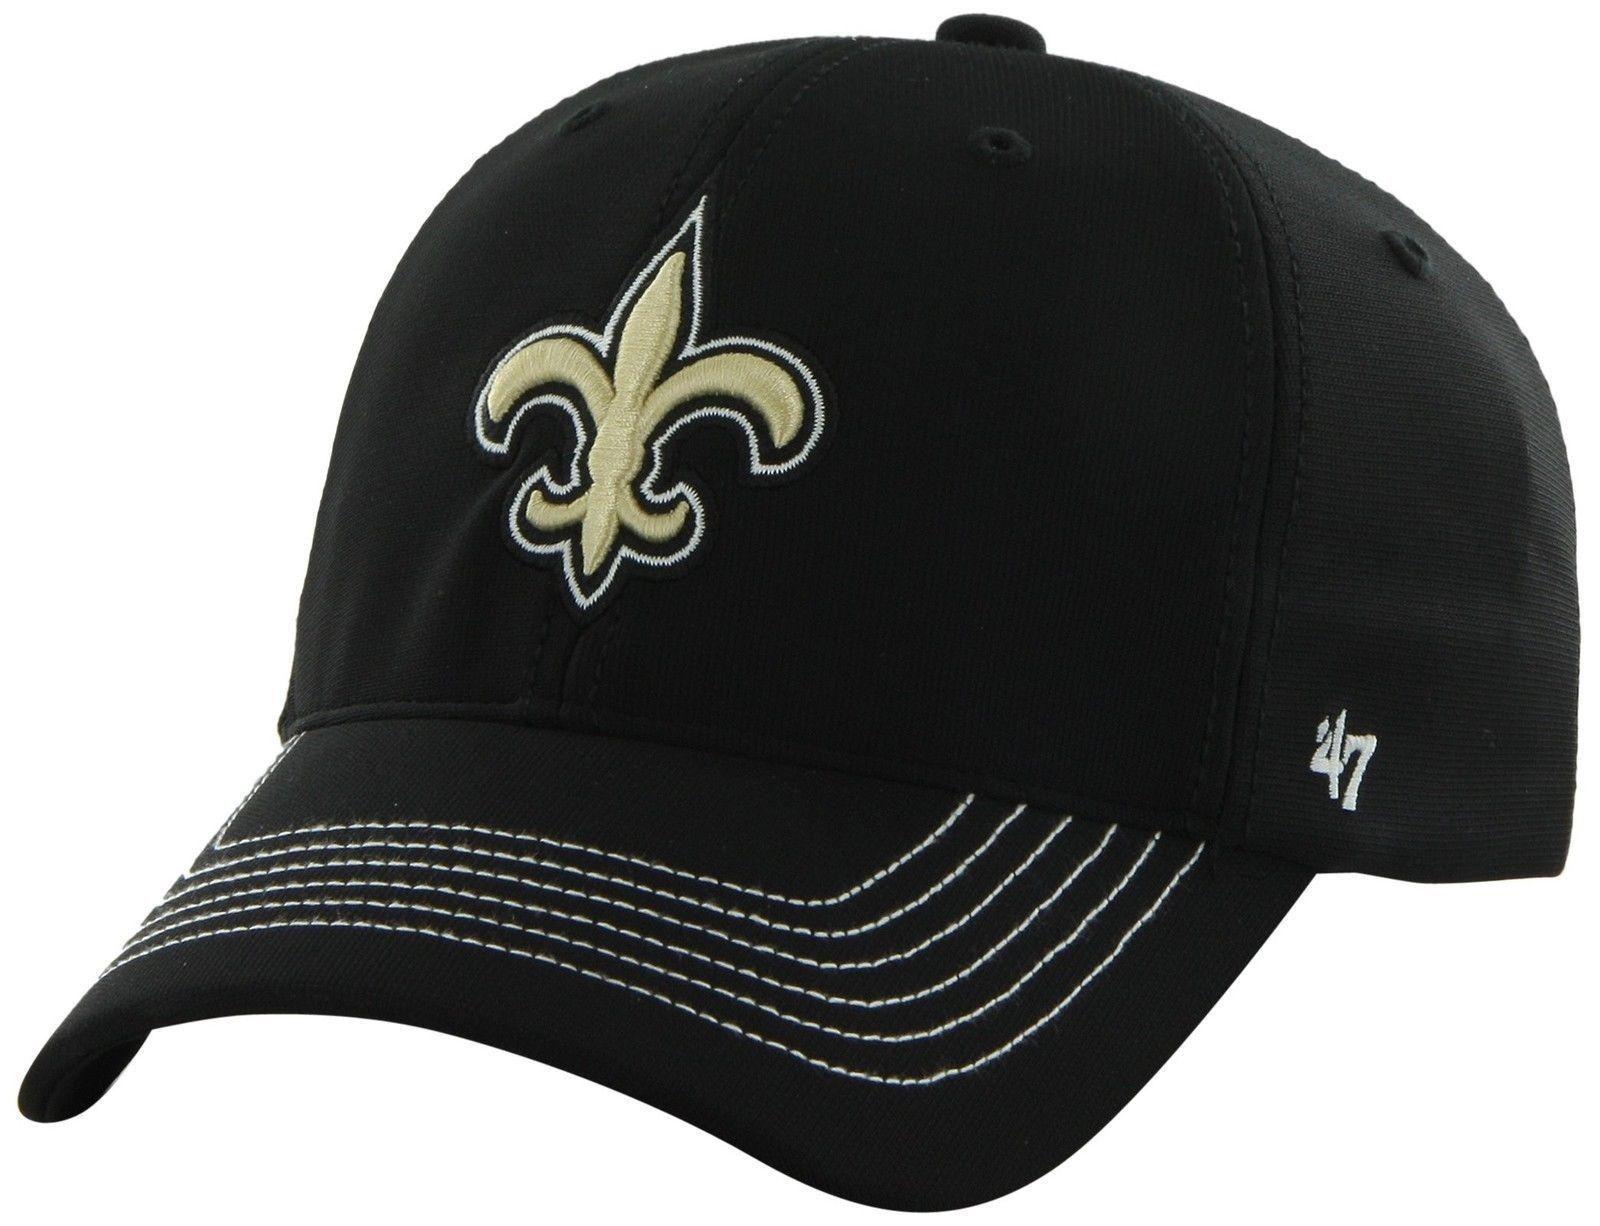 893cd4907df Nfl Game Time Closer Stretch Fit Cap New Orleans Saints